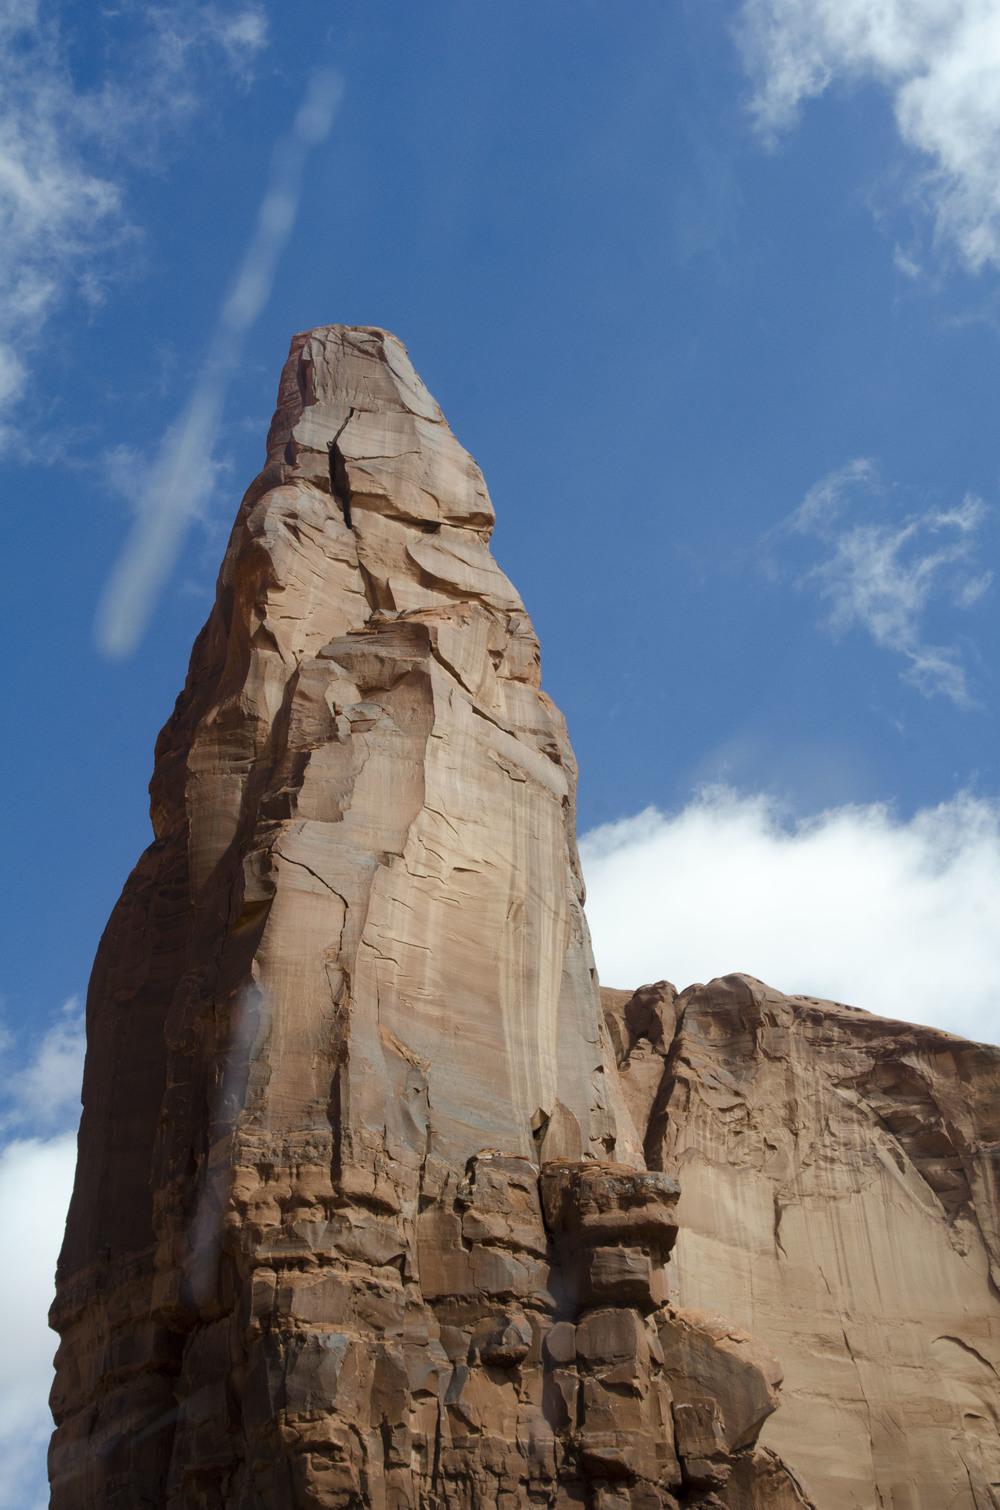 monument-valley-blog-post-06.JPG